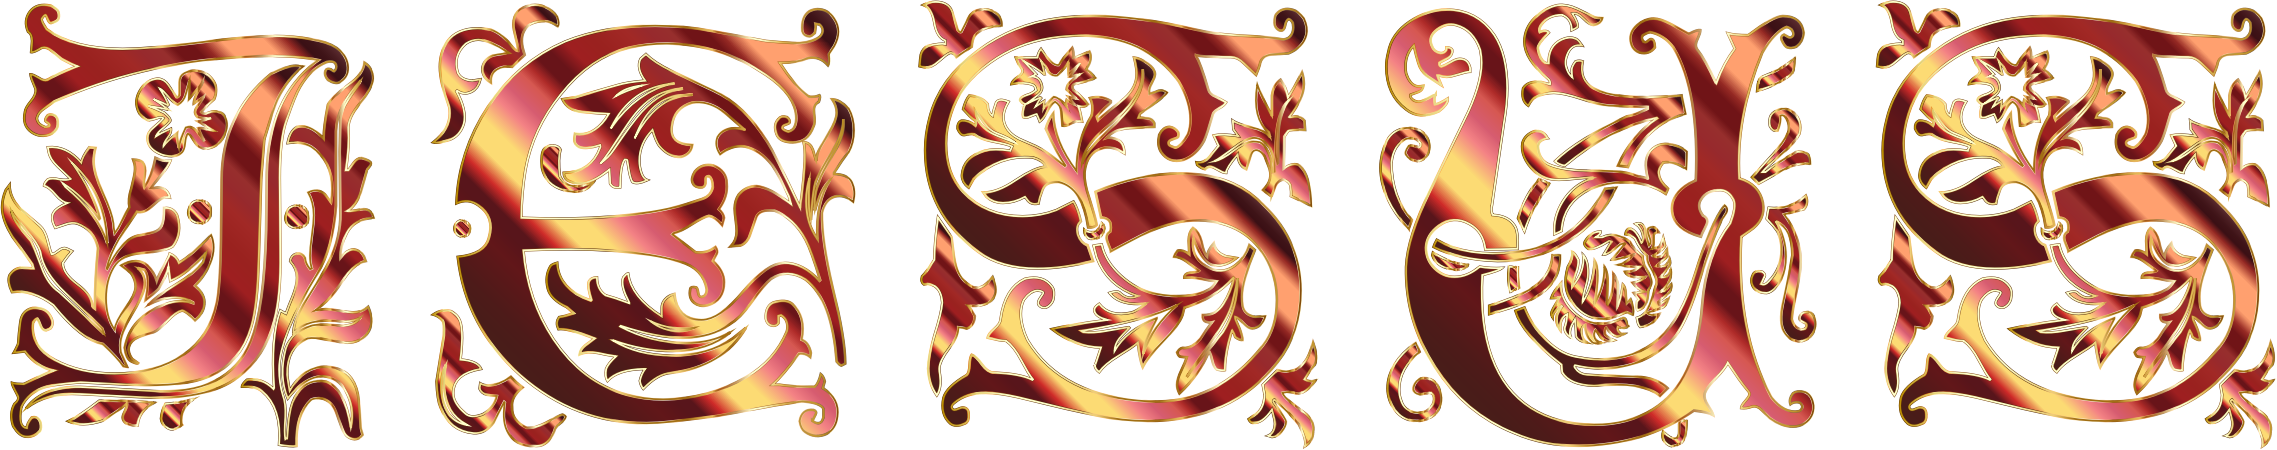 Elegant catholic cross clipart transparent Clipart - Jesus Elegant Typography 4 No Background transparent